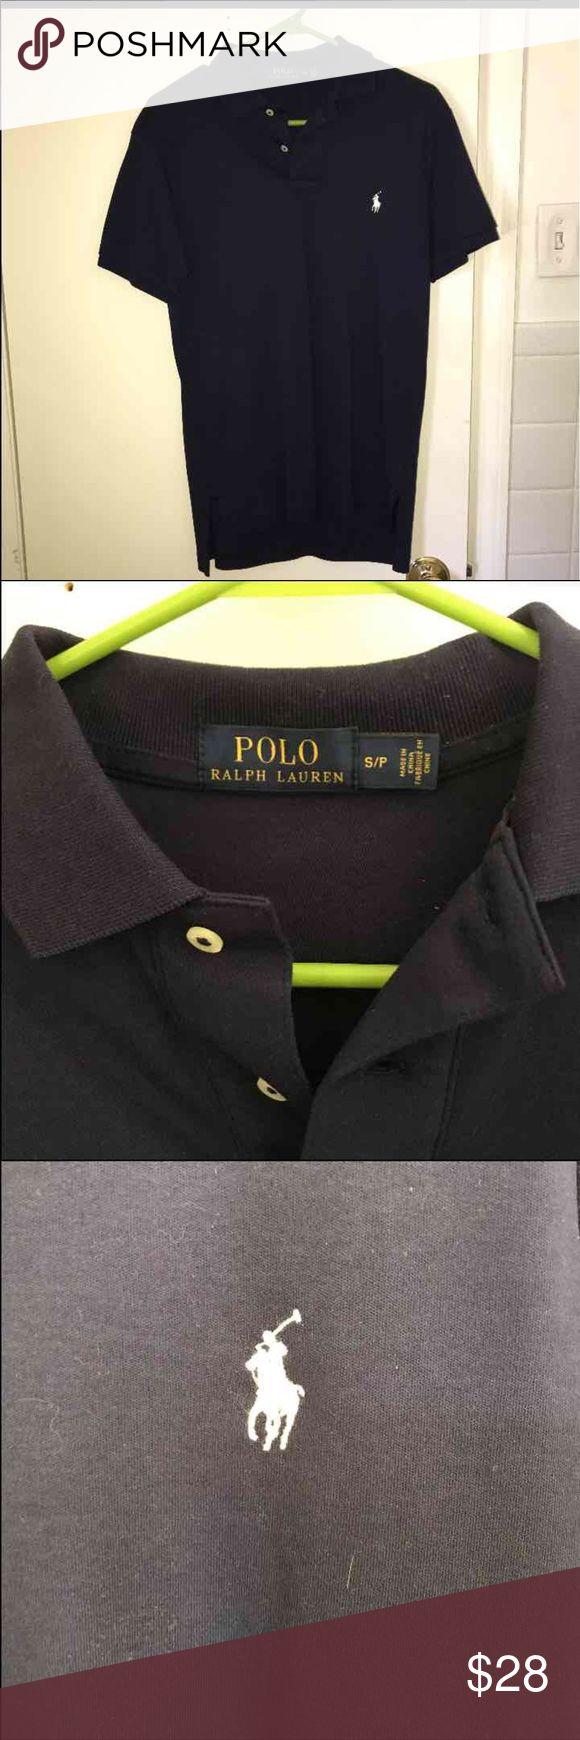 MENS POLO RALPH LAUREN SHIRT 😍 Brand new never worn polo men's shirt!! Navy color not black 😊 Polo by Ralph Lauren Shirts Polos